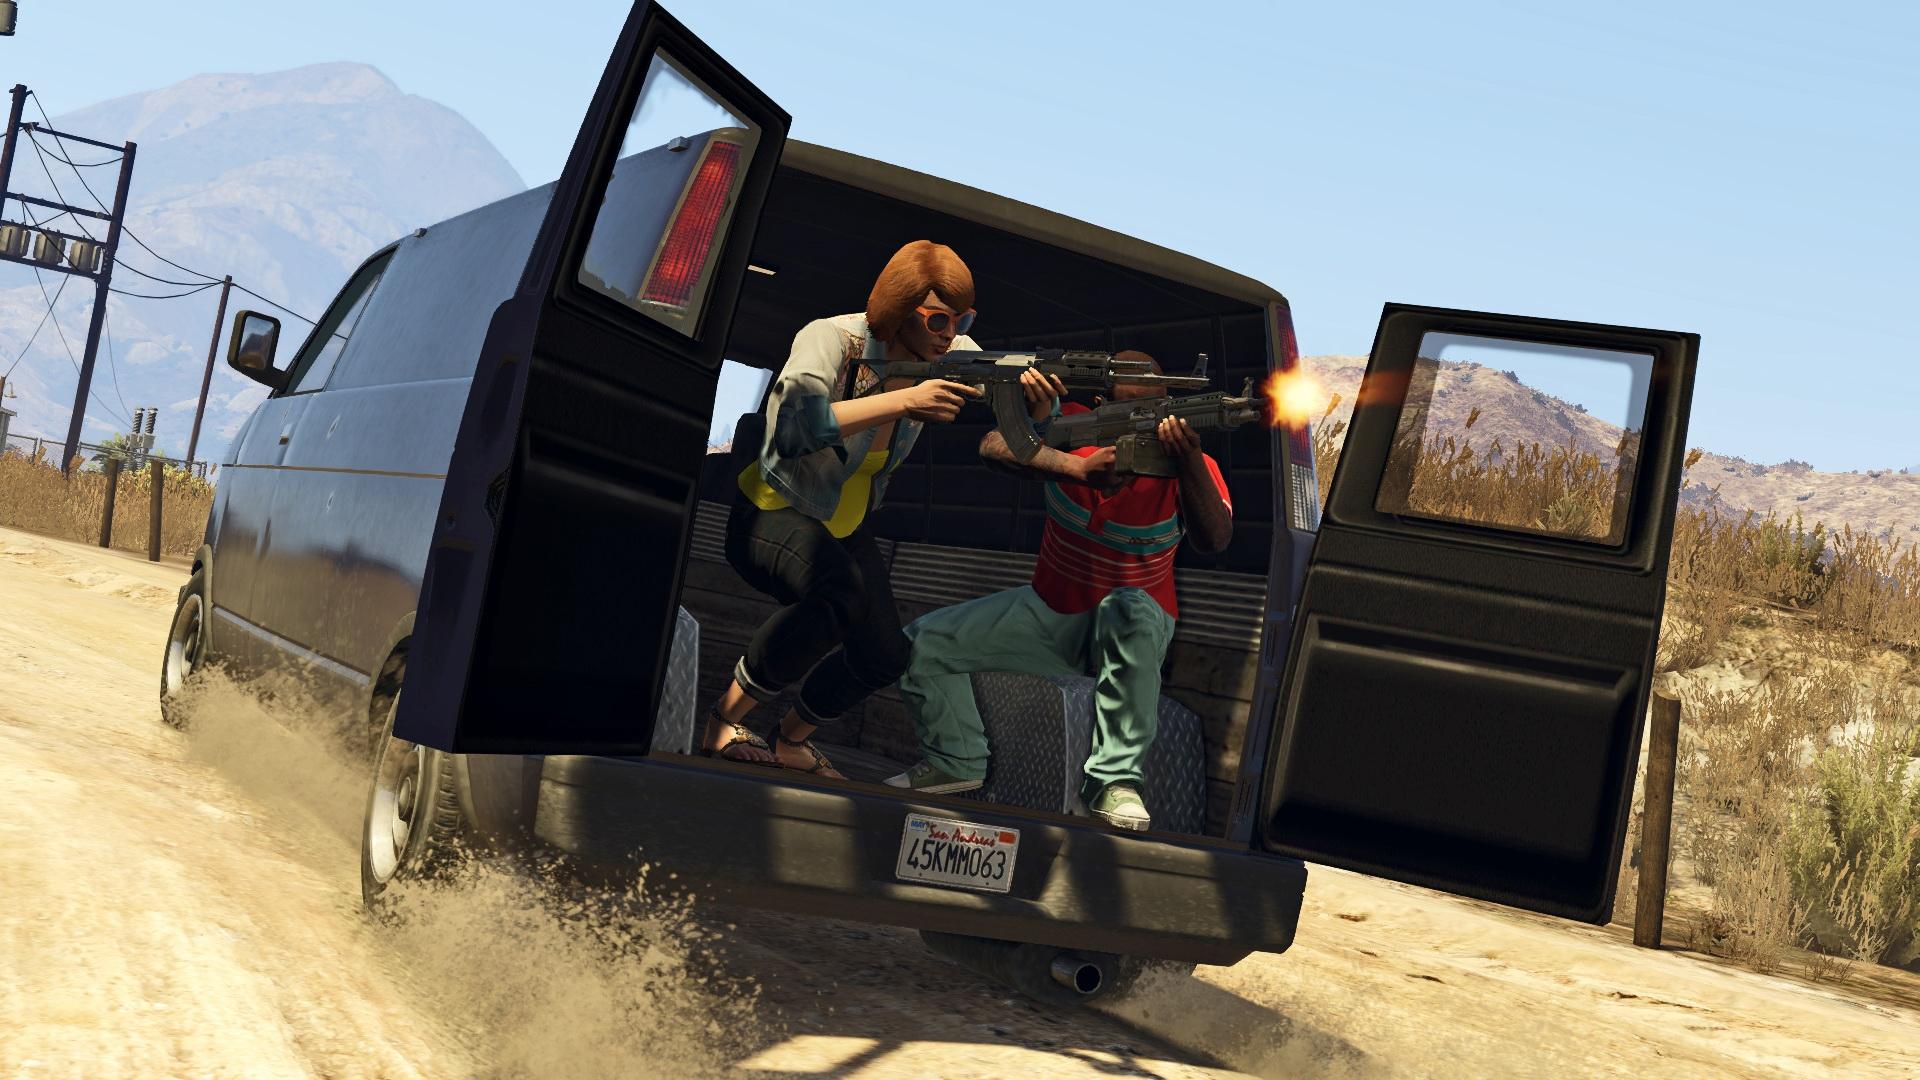 продажи Gta V для Ps4 и Xbox One превзошли ожидания аналитиков